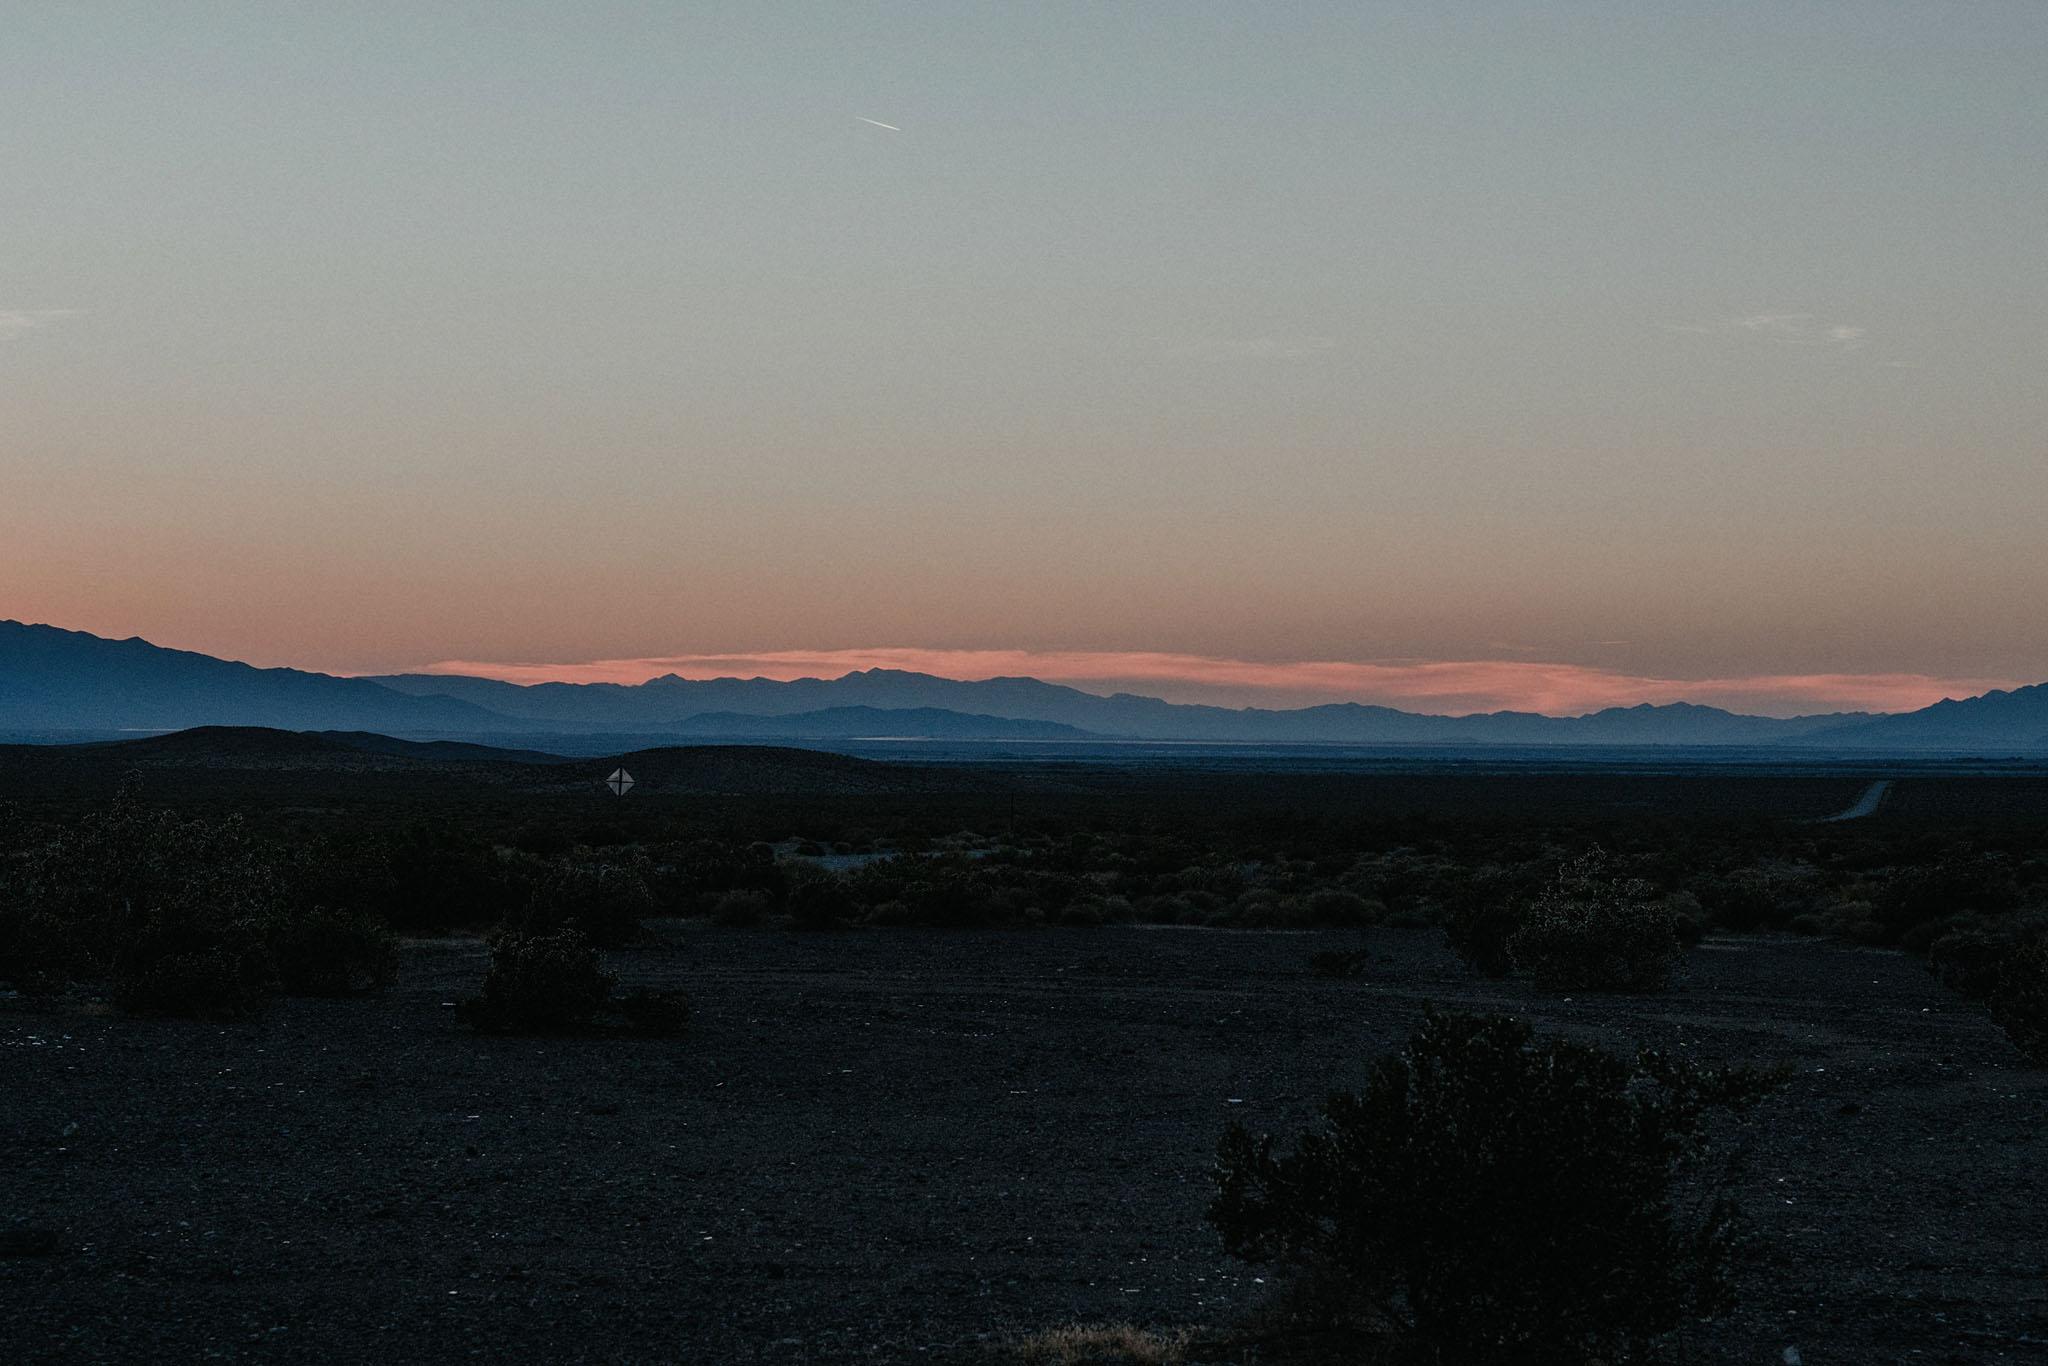 death valley adventure elopement wedding photographer national park sunset photo